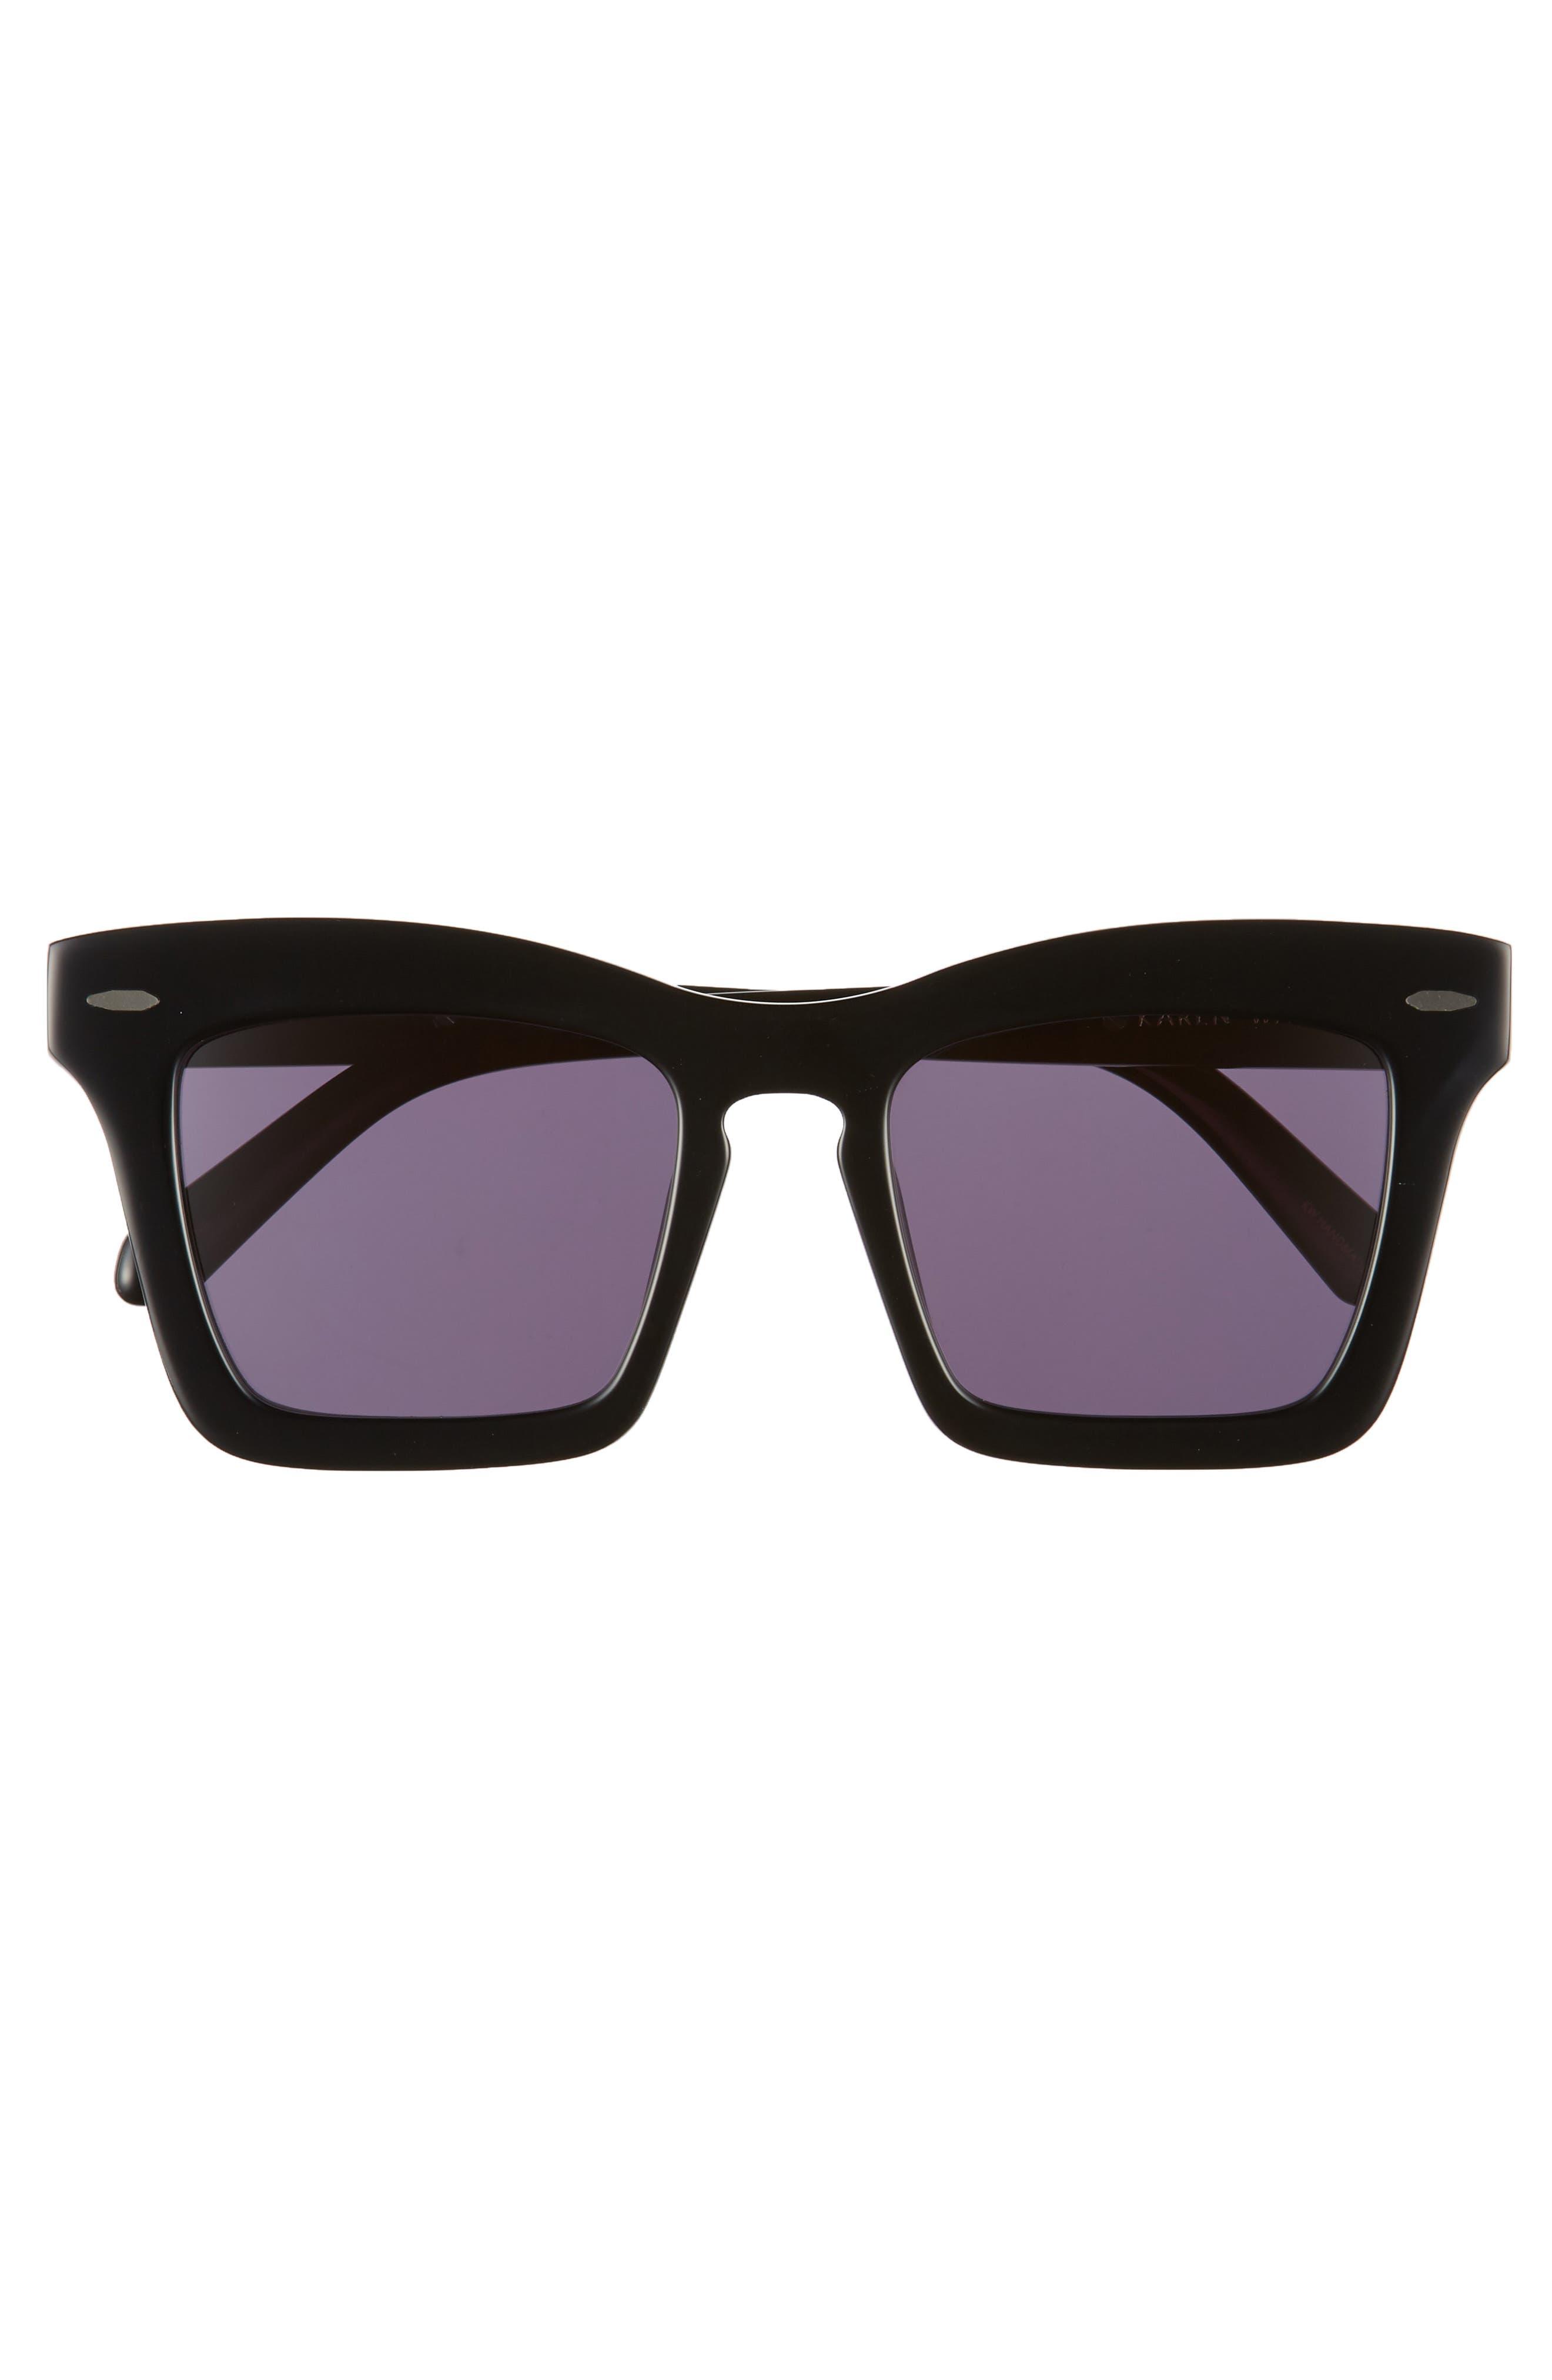 Banks 51mm Rectangular Sunglasses,                             Alternate thumbnail 3, color,                             BLACK